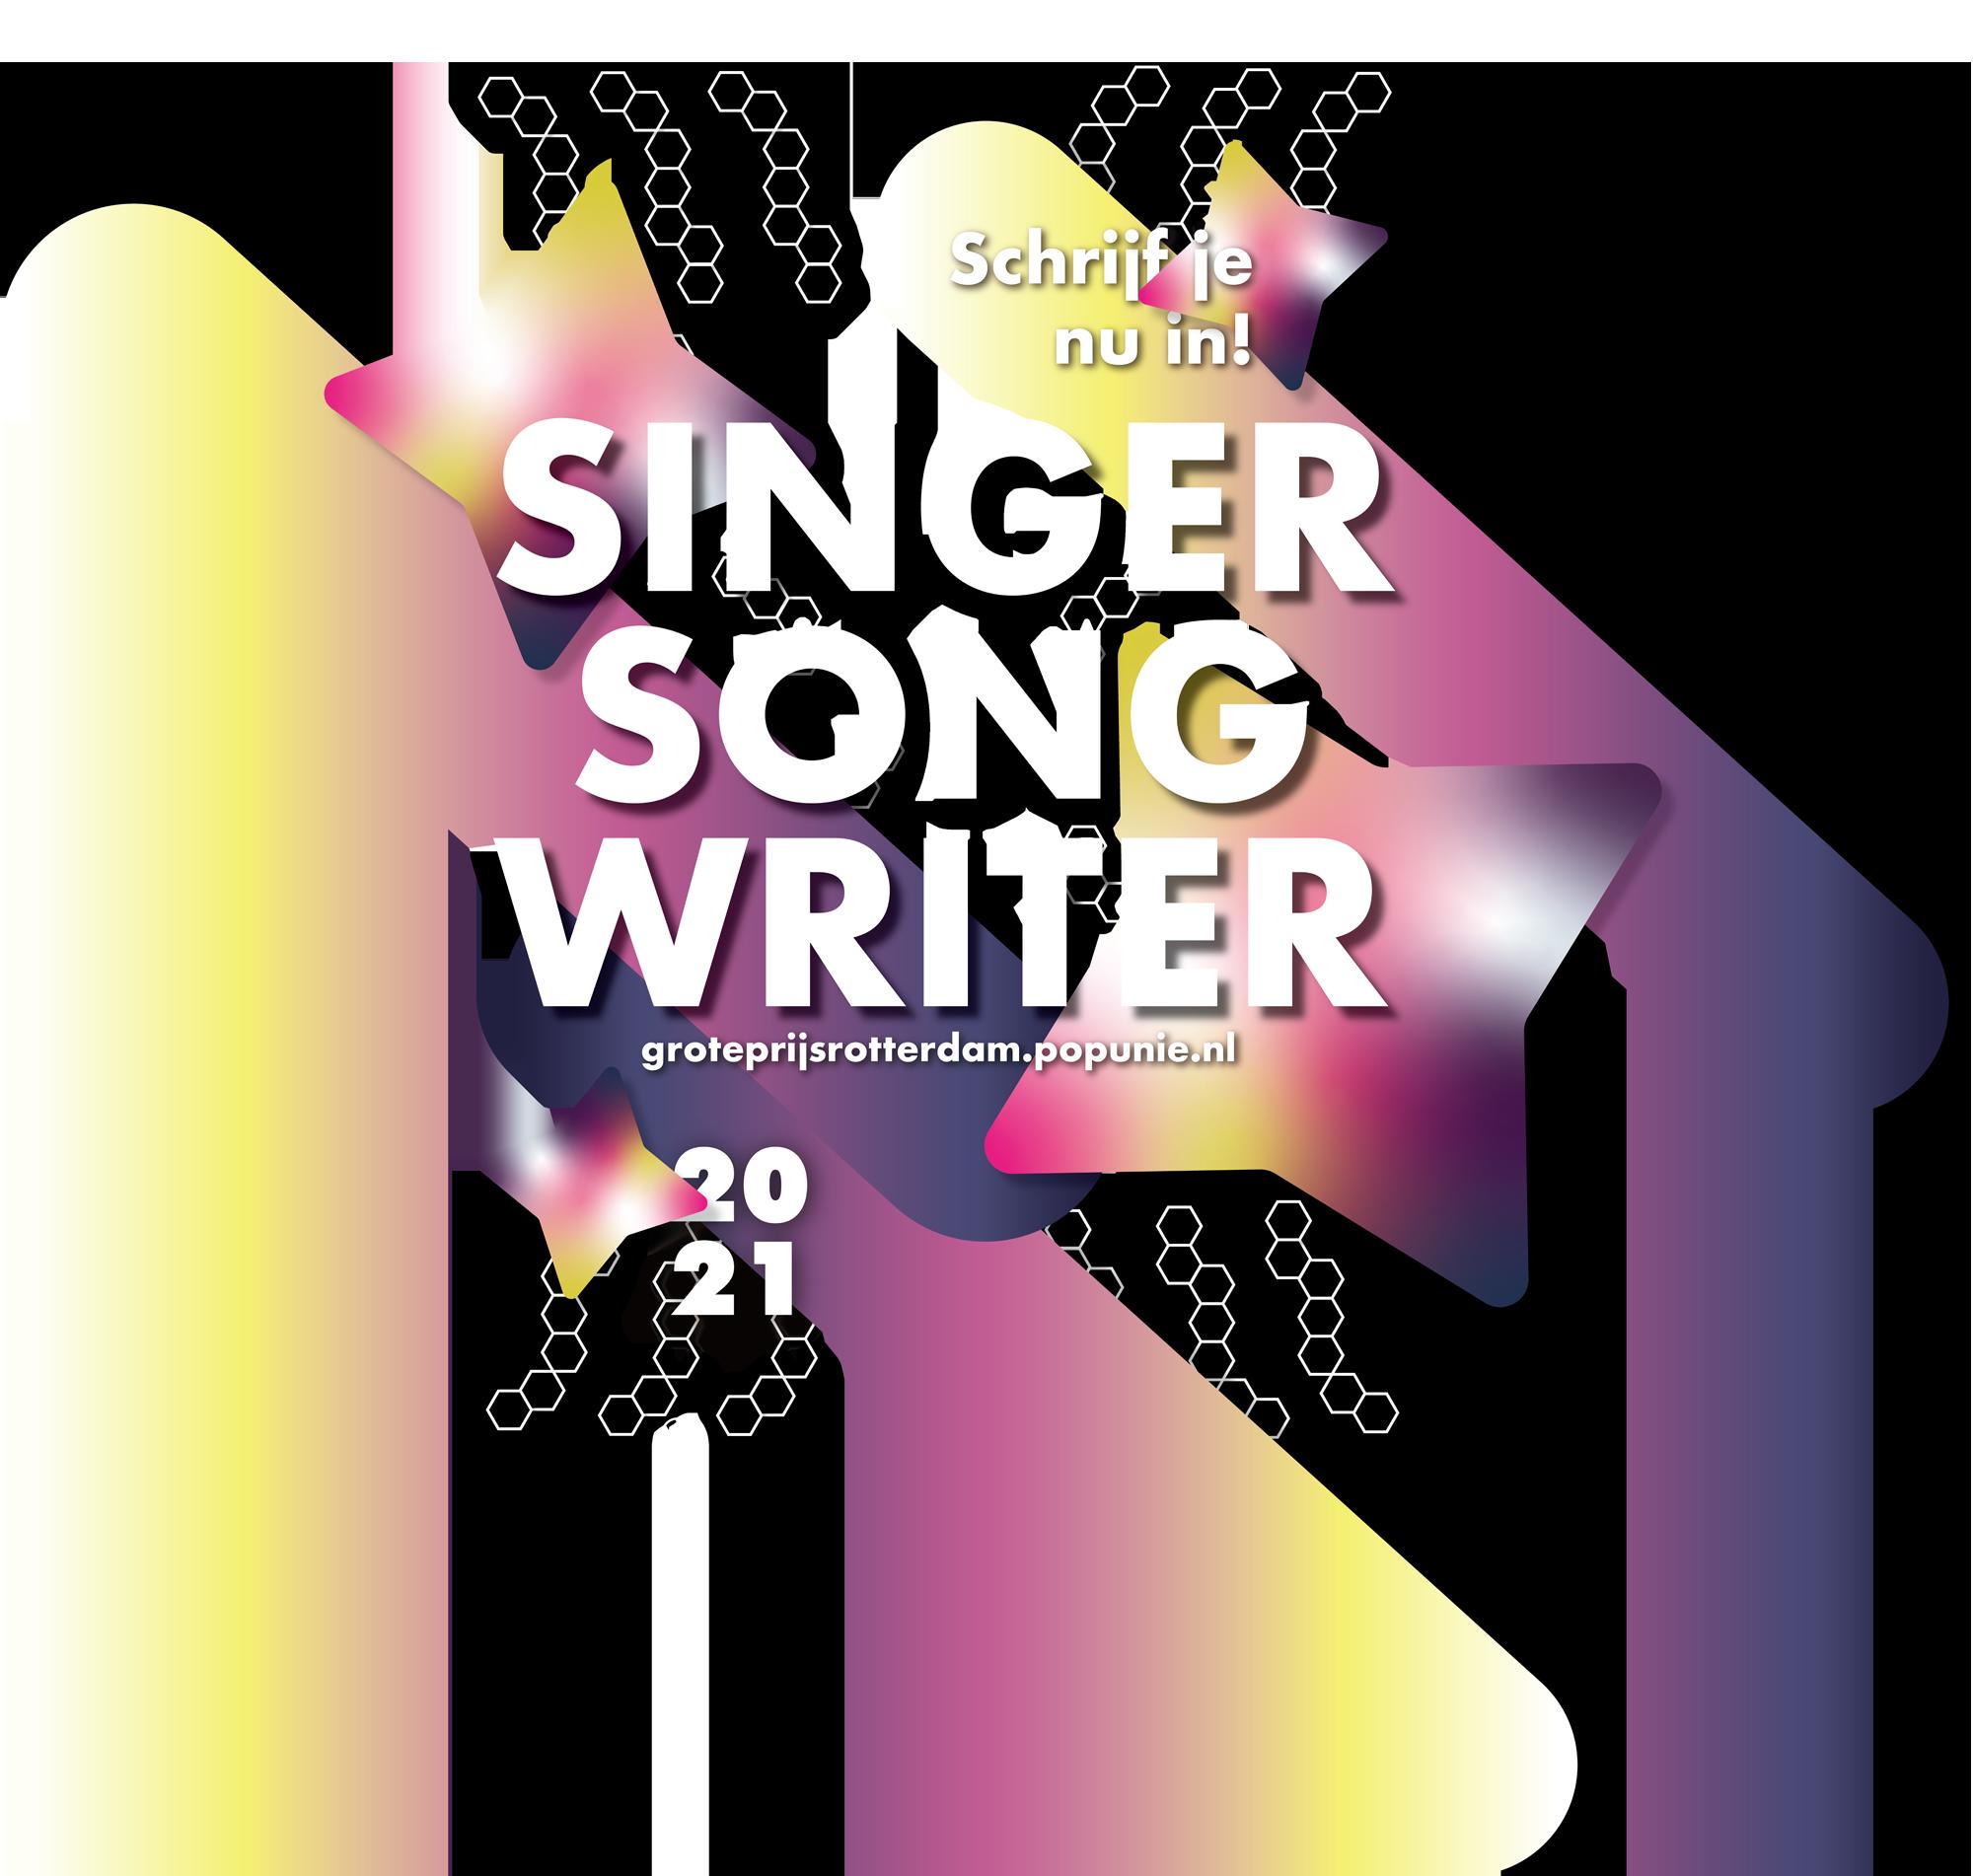 Logo van Sena Grote Prijs van Rotterdam, categorie Singer/songwriter